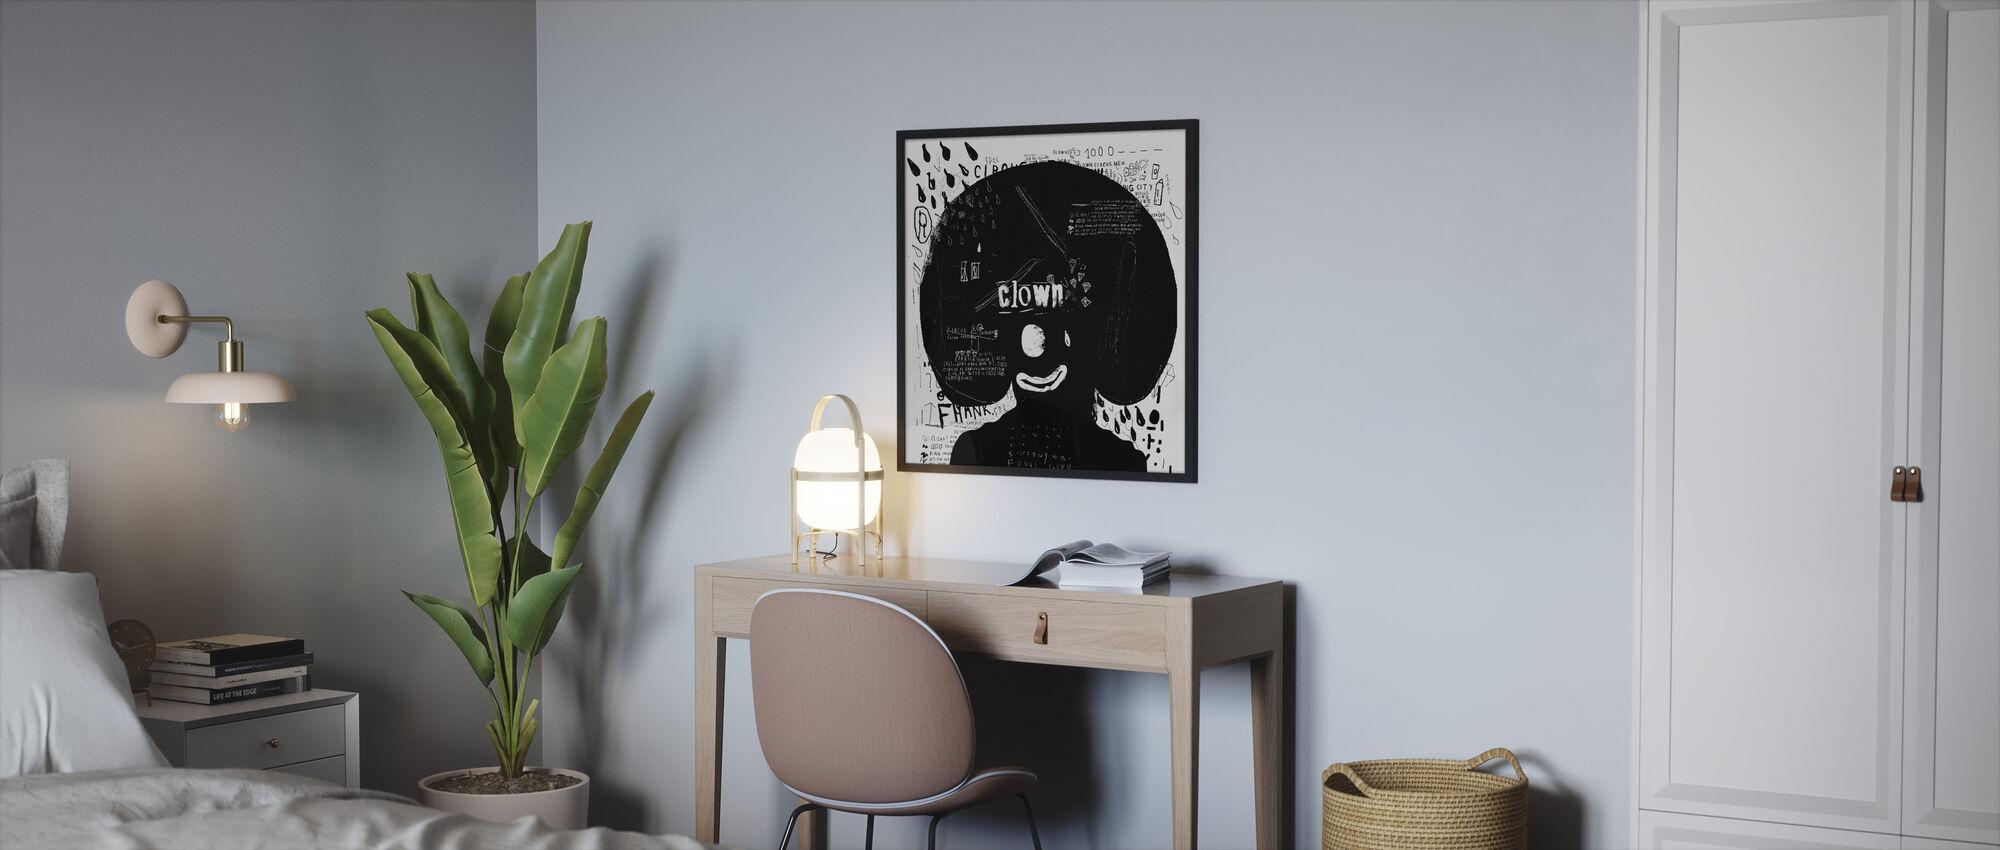 Clown - Framed print - Bedroom